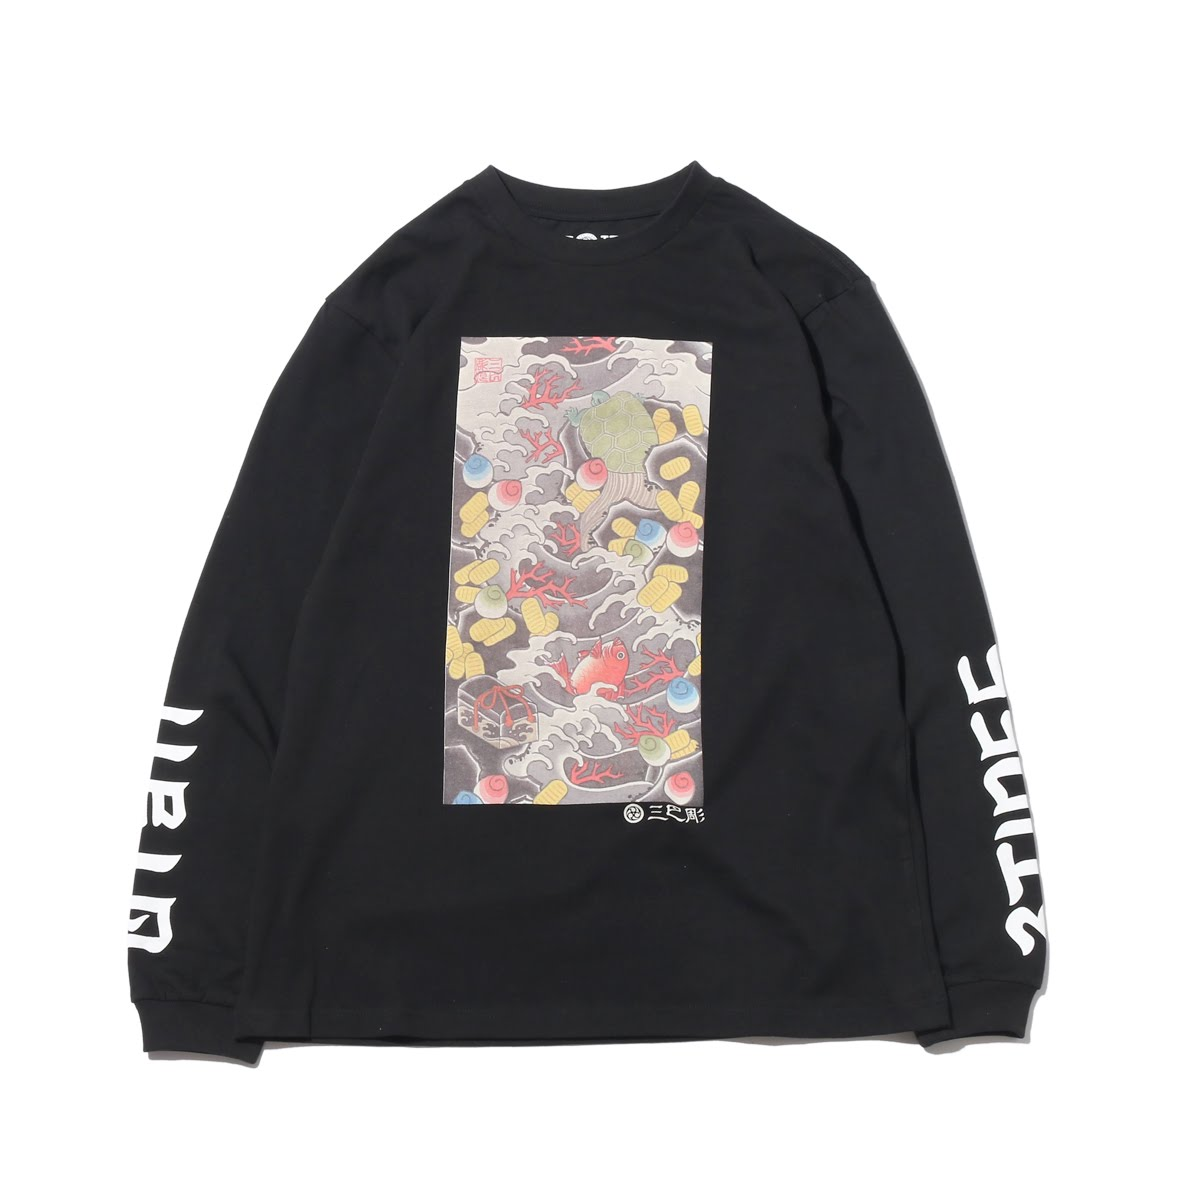 "UBIQ ""IREZUMI"" LS T-SHIRT(Takarazukushi) Designed by NAMI(イレズミ ロングスリーブ Tシャツ(タカラズクシ) デザインド バイ ナミ)(BLACK)18SS-I"